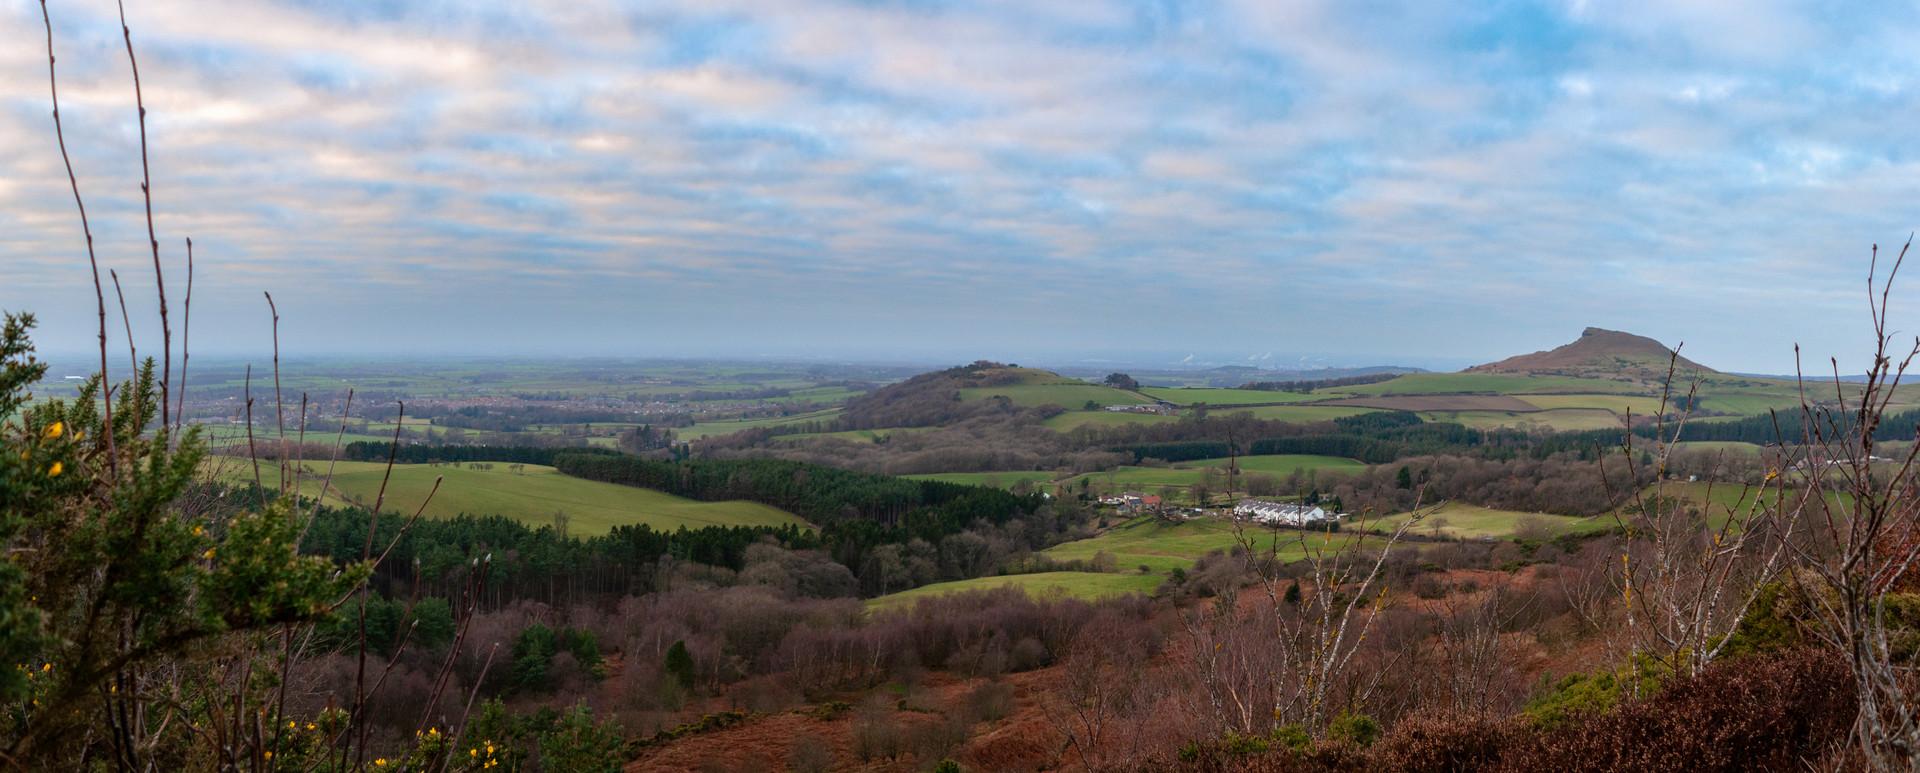 Roseberry Topping Panorama